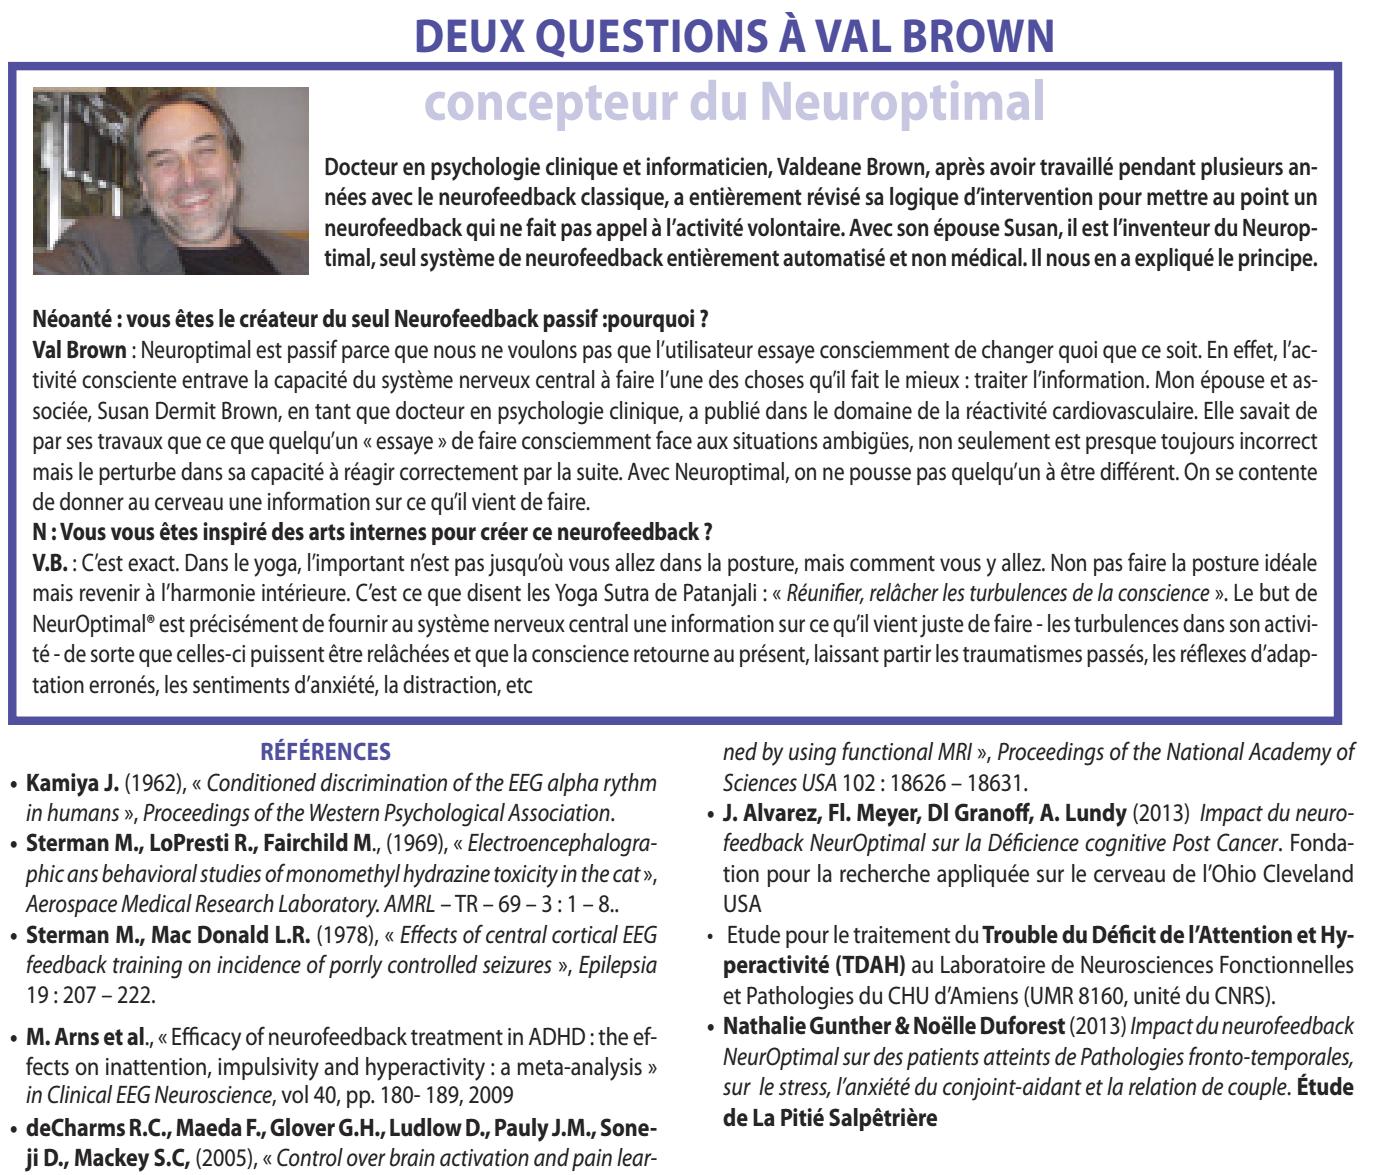 2 questions à Val Brown